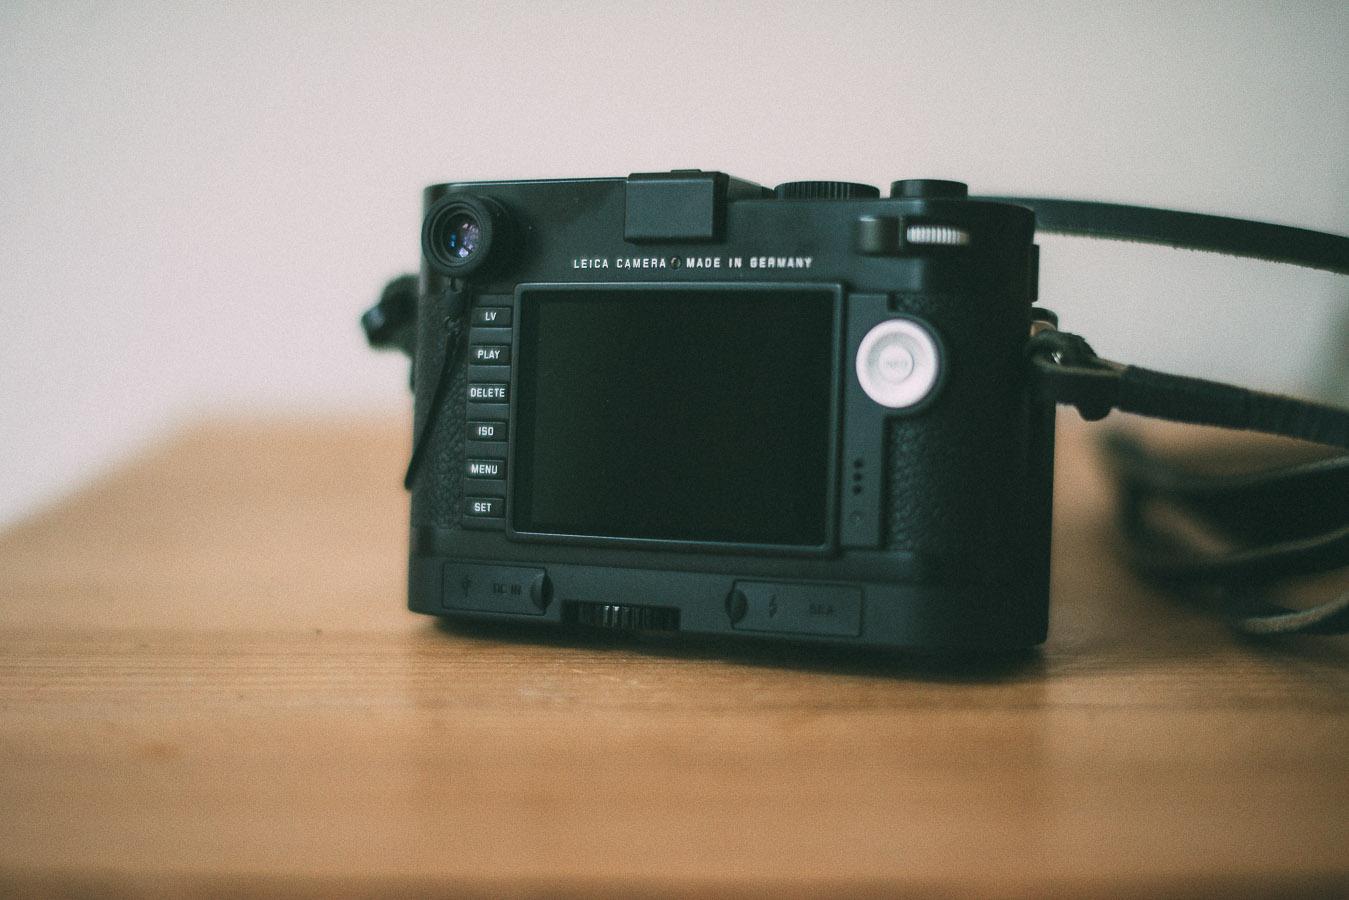 Leica Multifunktion Handgriff-M